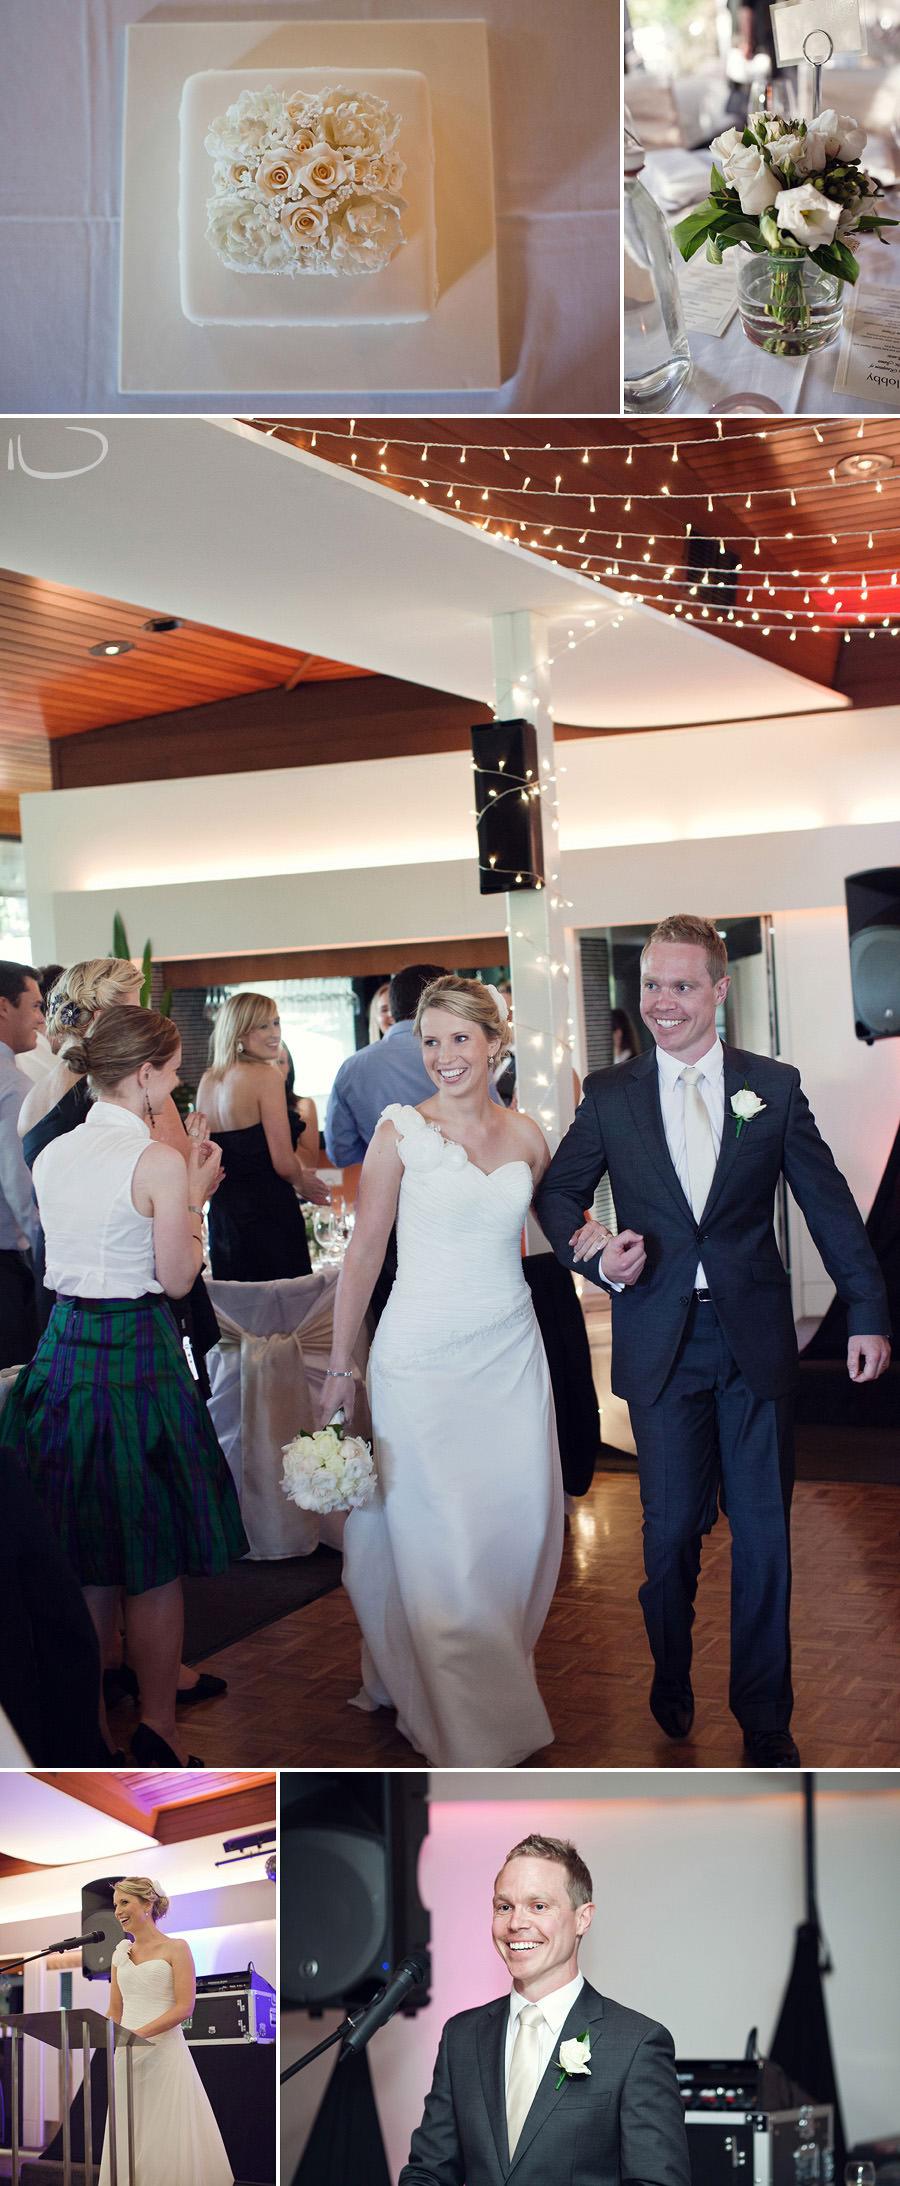 The Lobby Wedding Photographer: Bride & Groom entering reception